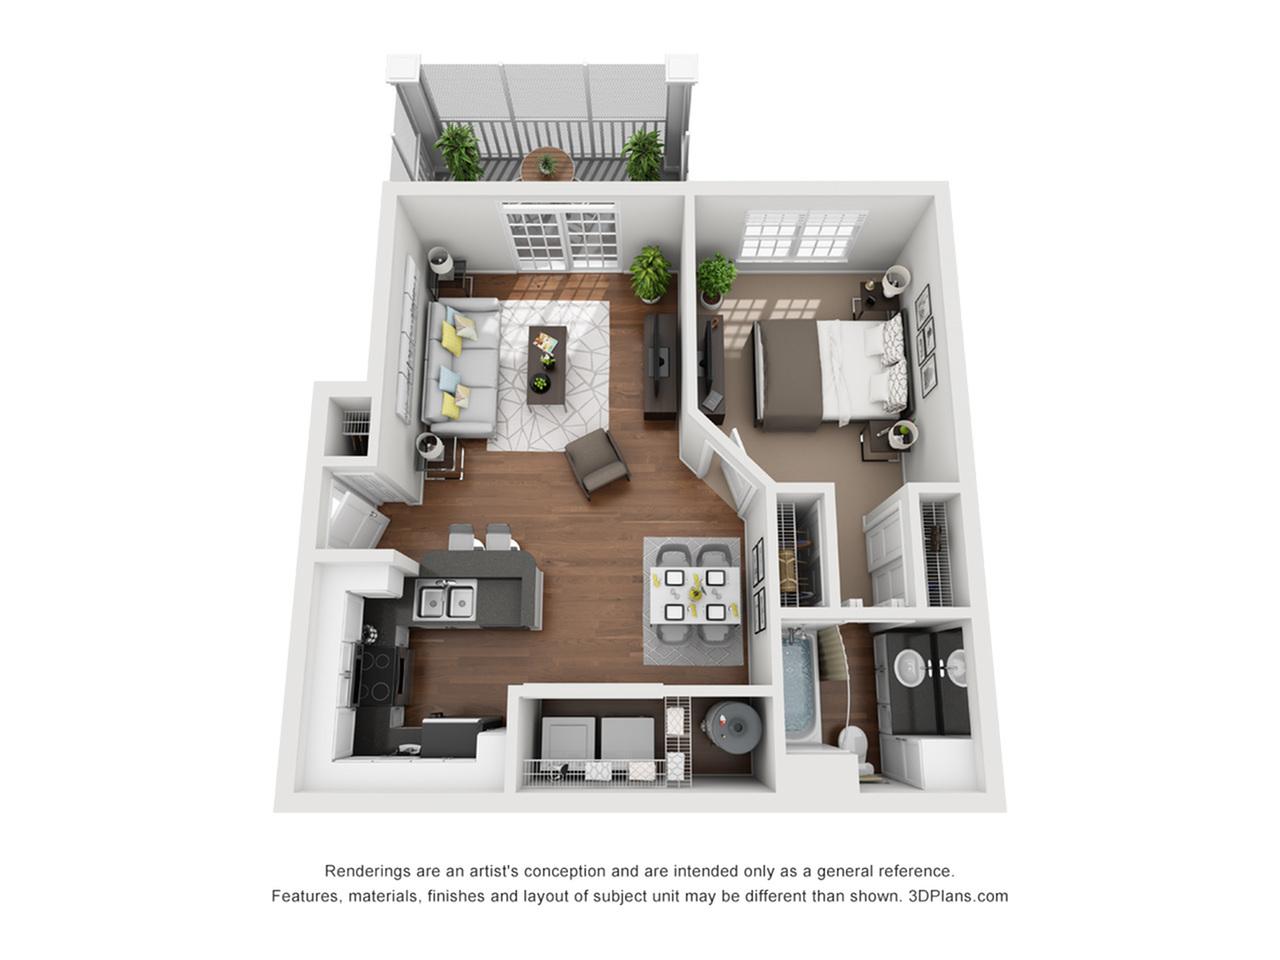 Air Balcony 665 Square Feet One Bedroom | One Bathroom